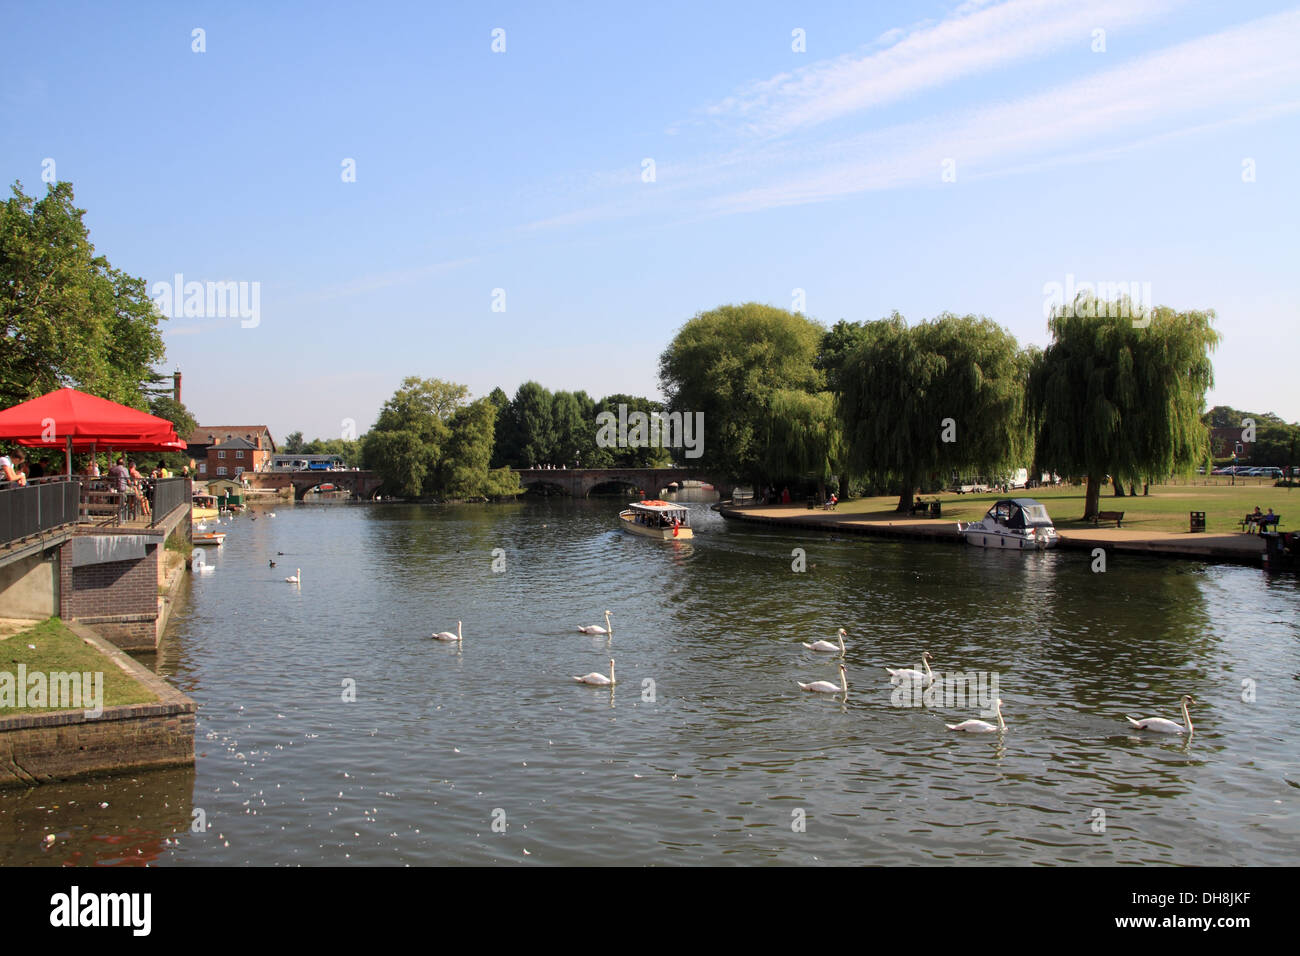 River Avon Stratford upon Avon - Stock Image